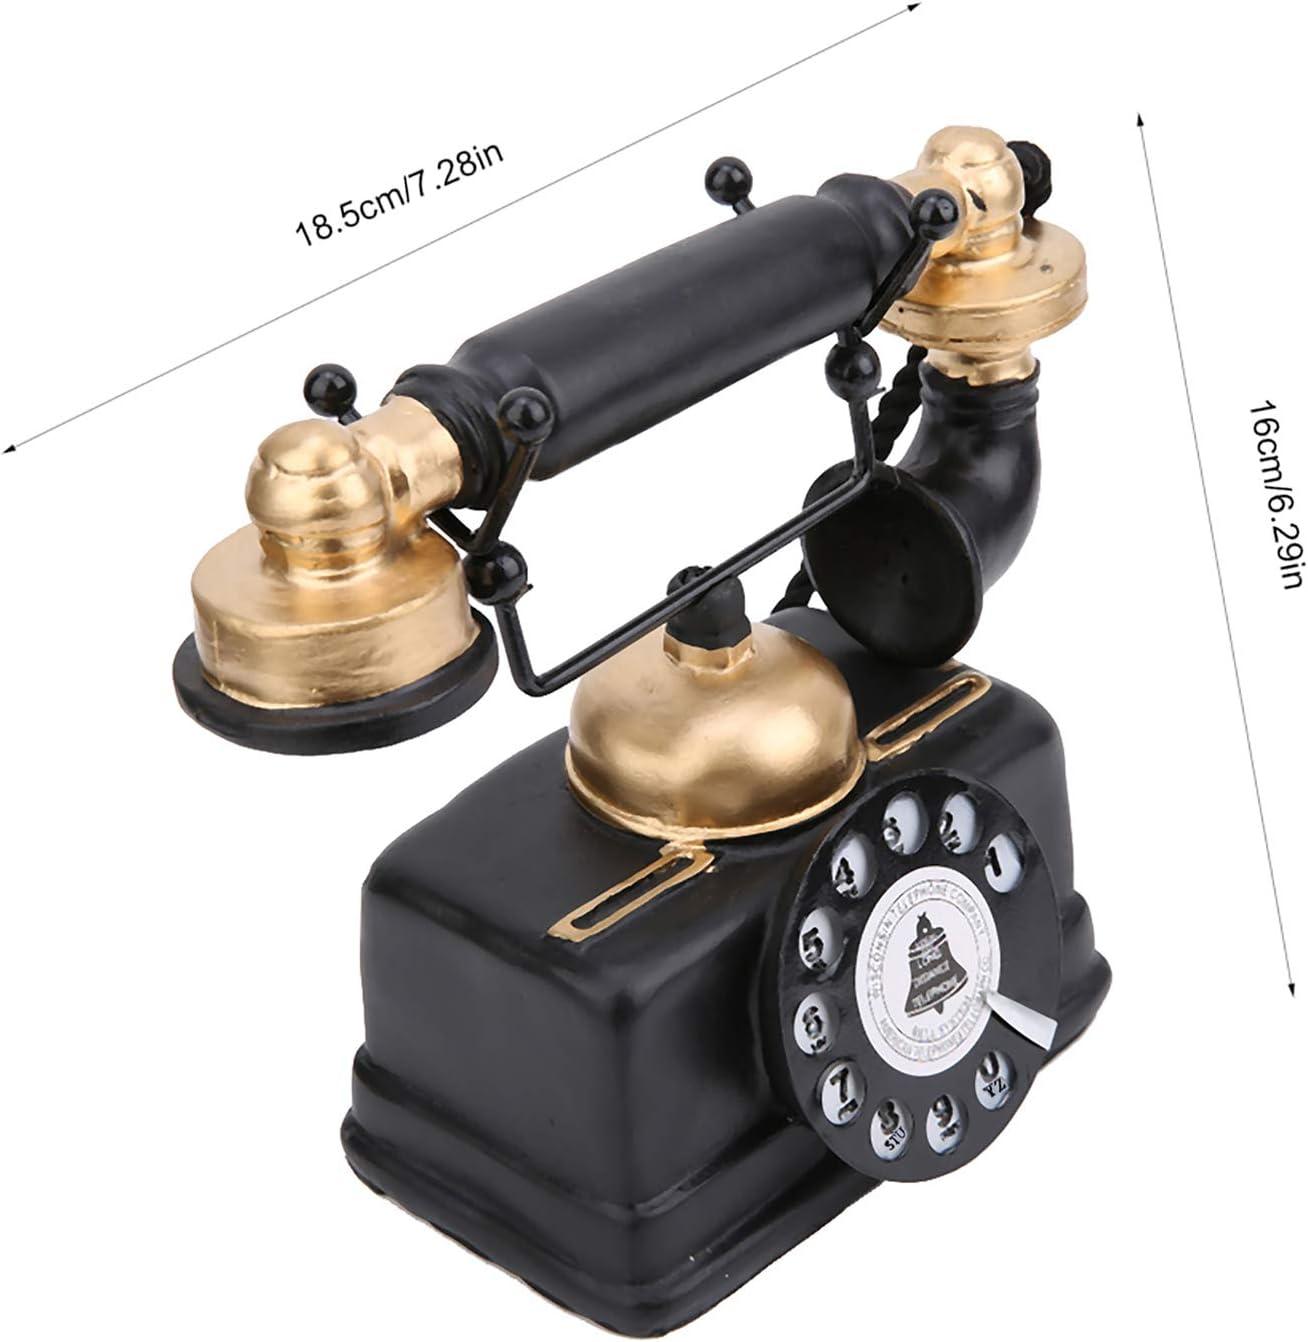 iFCOW Vintage Retro Antique Phone Vintage Bedroom Decor Wired Corded Landline Telephone Home Desk Decor Ornament